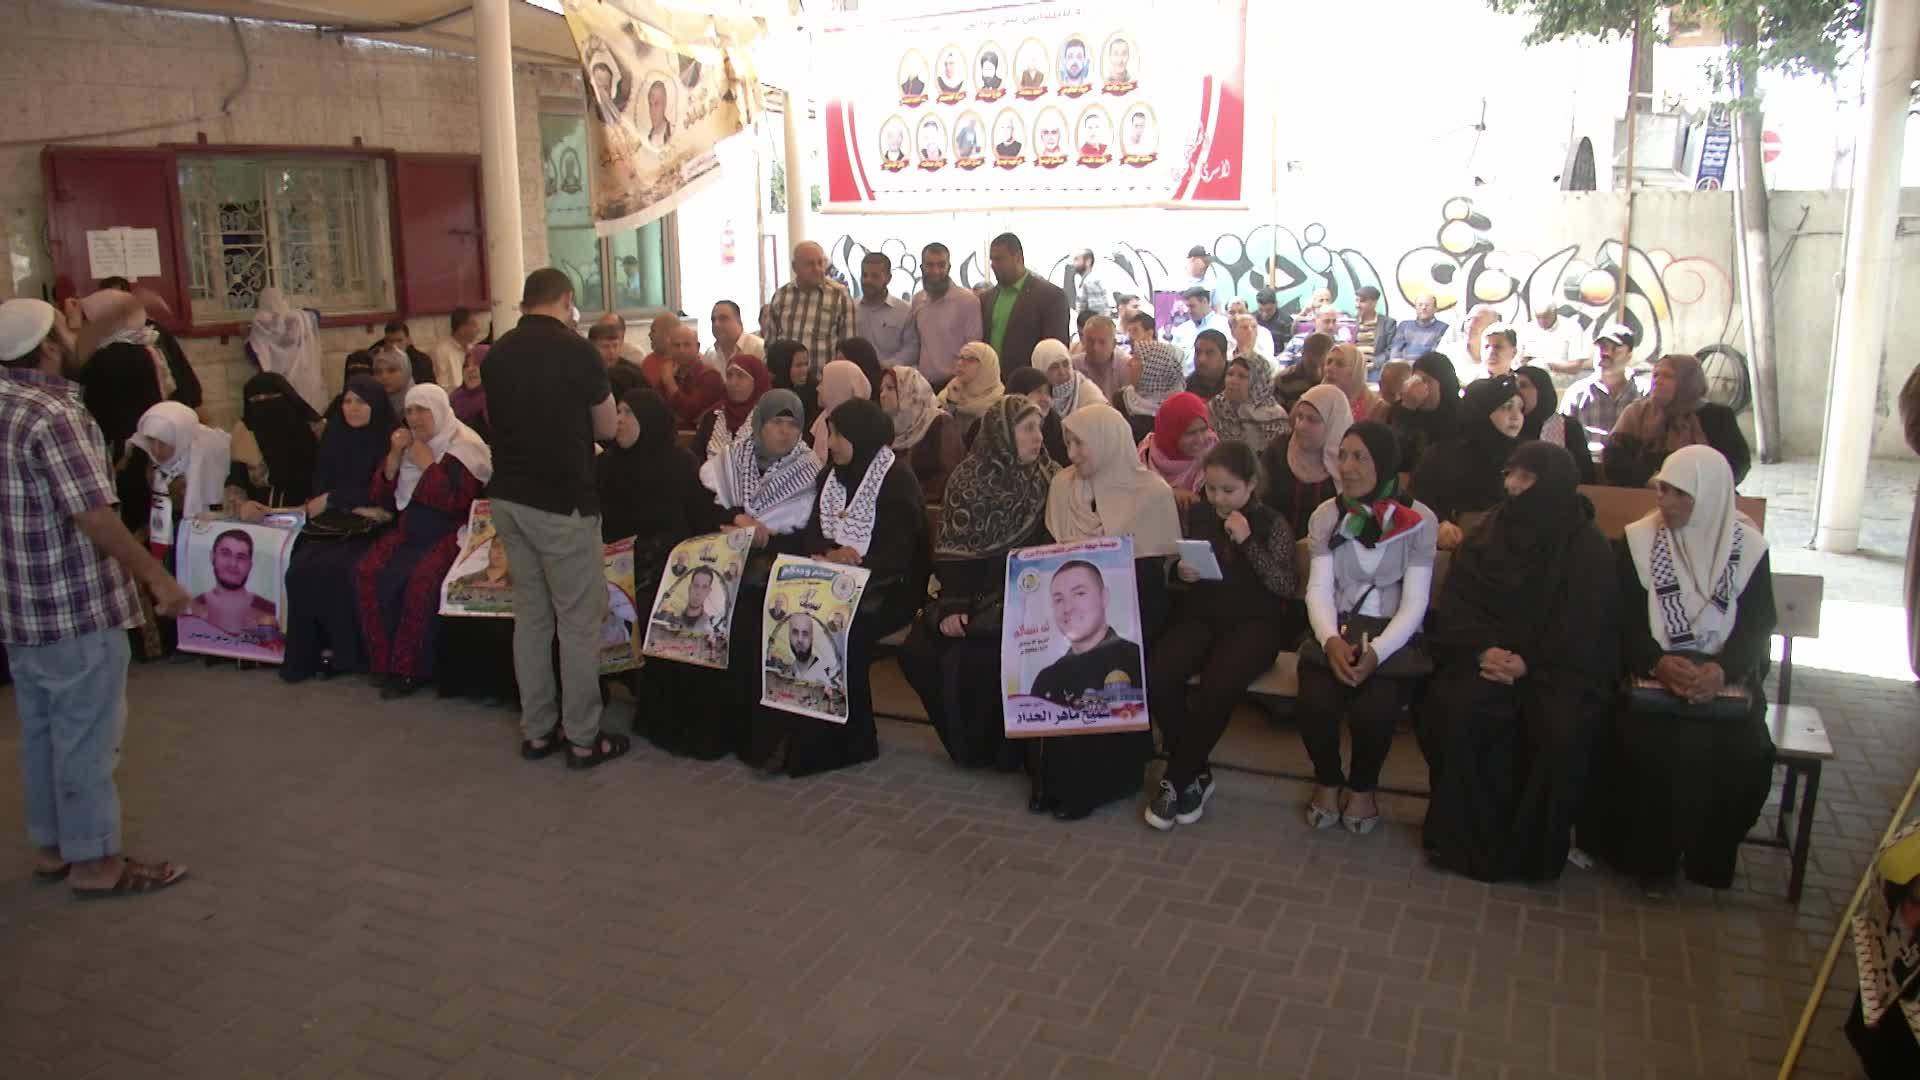 Demonstration in support of Palestinian prisoners in Israeli Jails